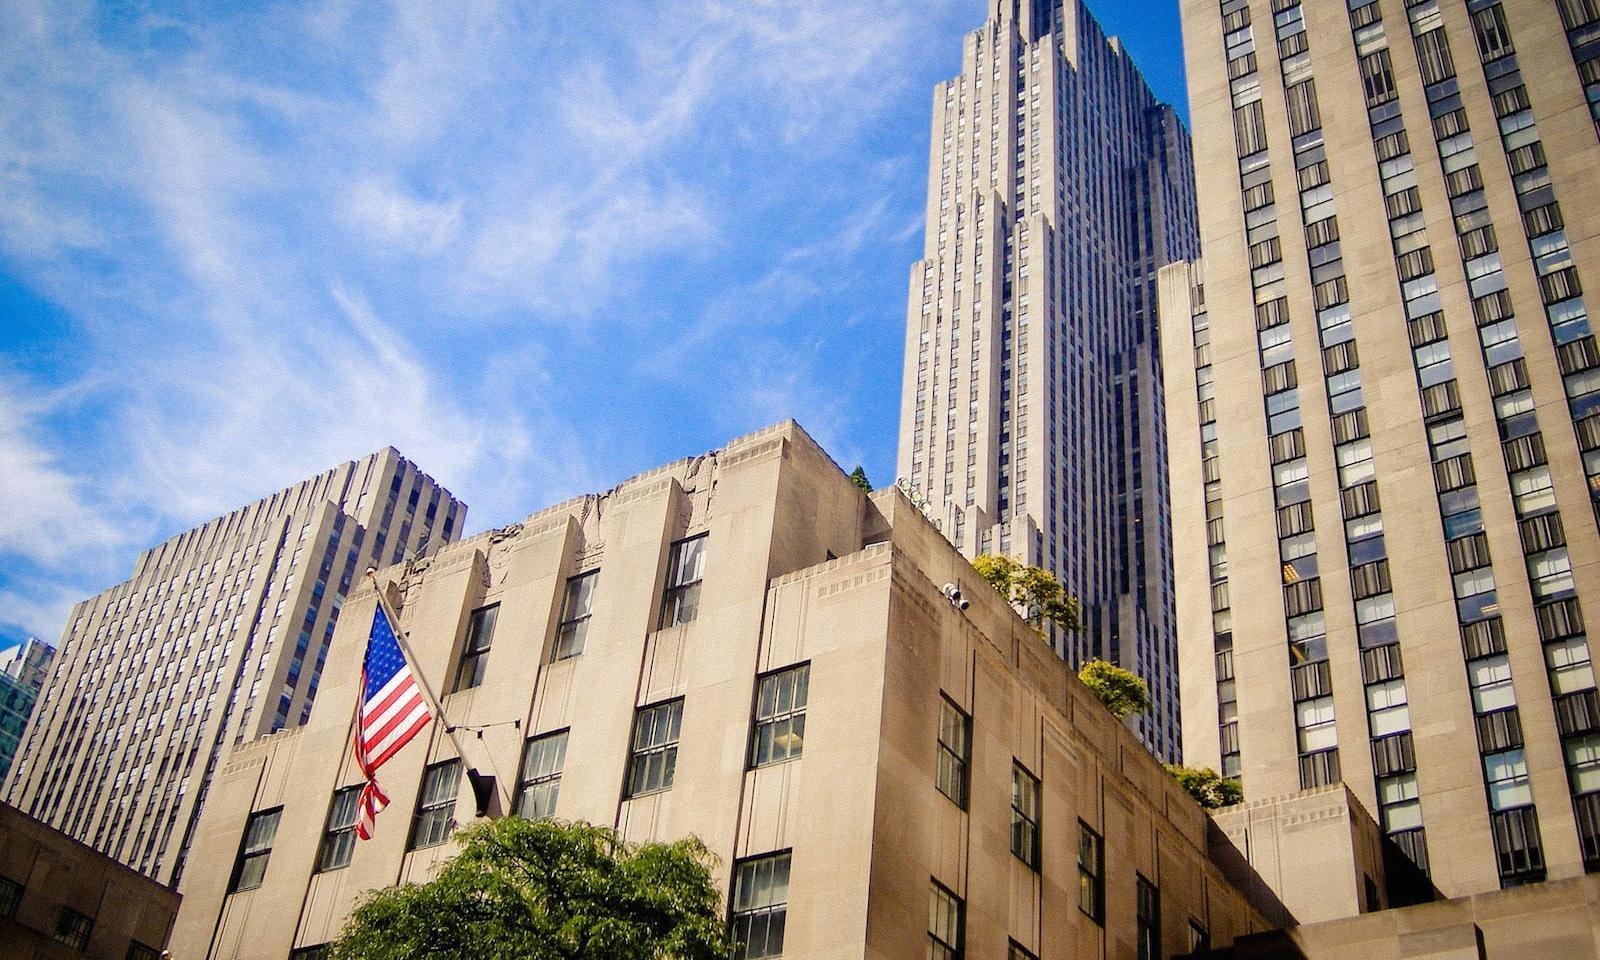 Alles zum Rockefeller Center in New York: Tickets, Touren & Insider-Guide